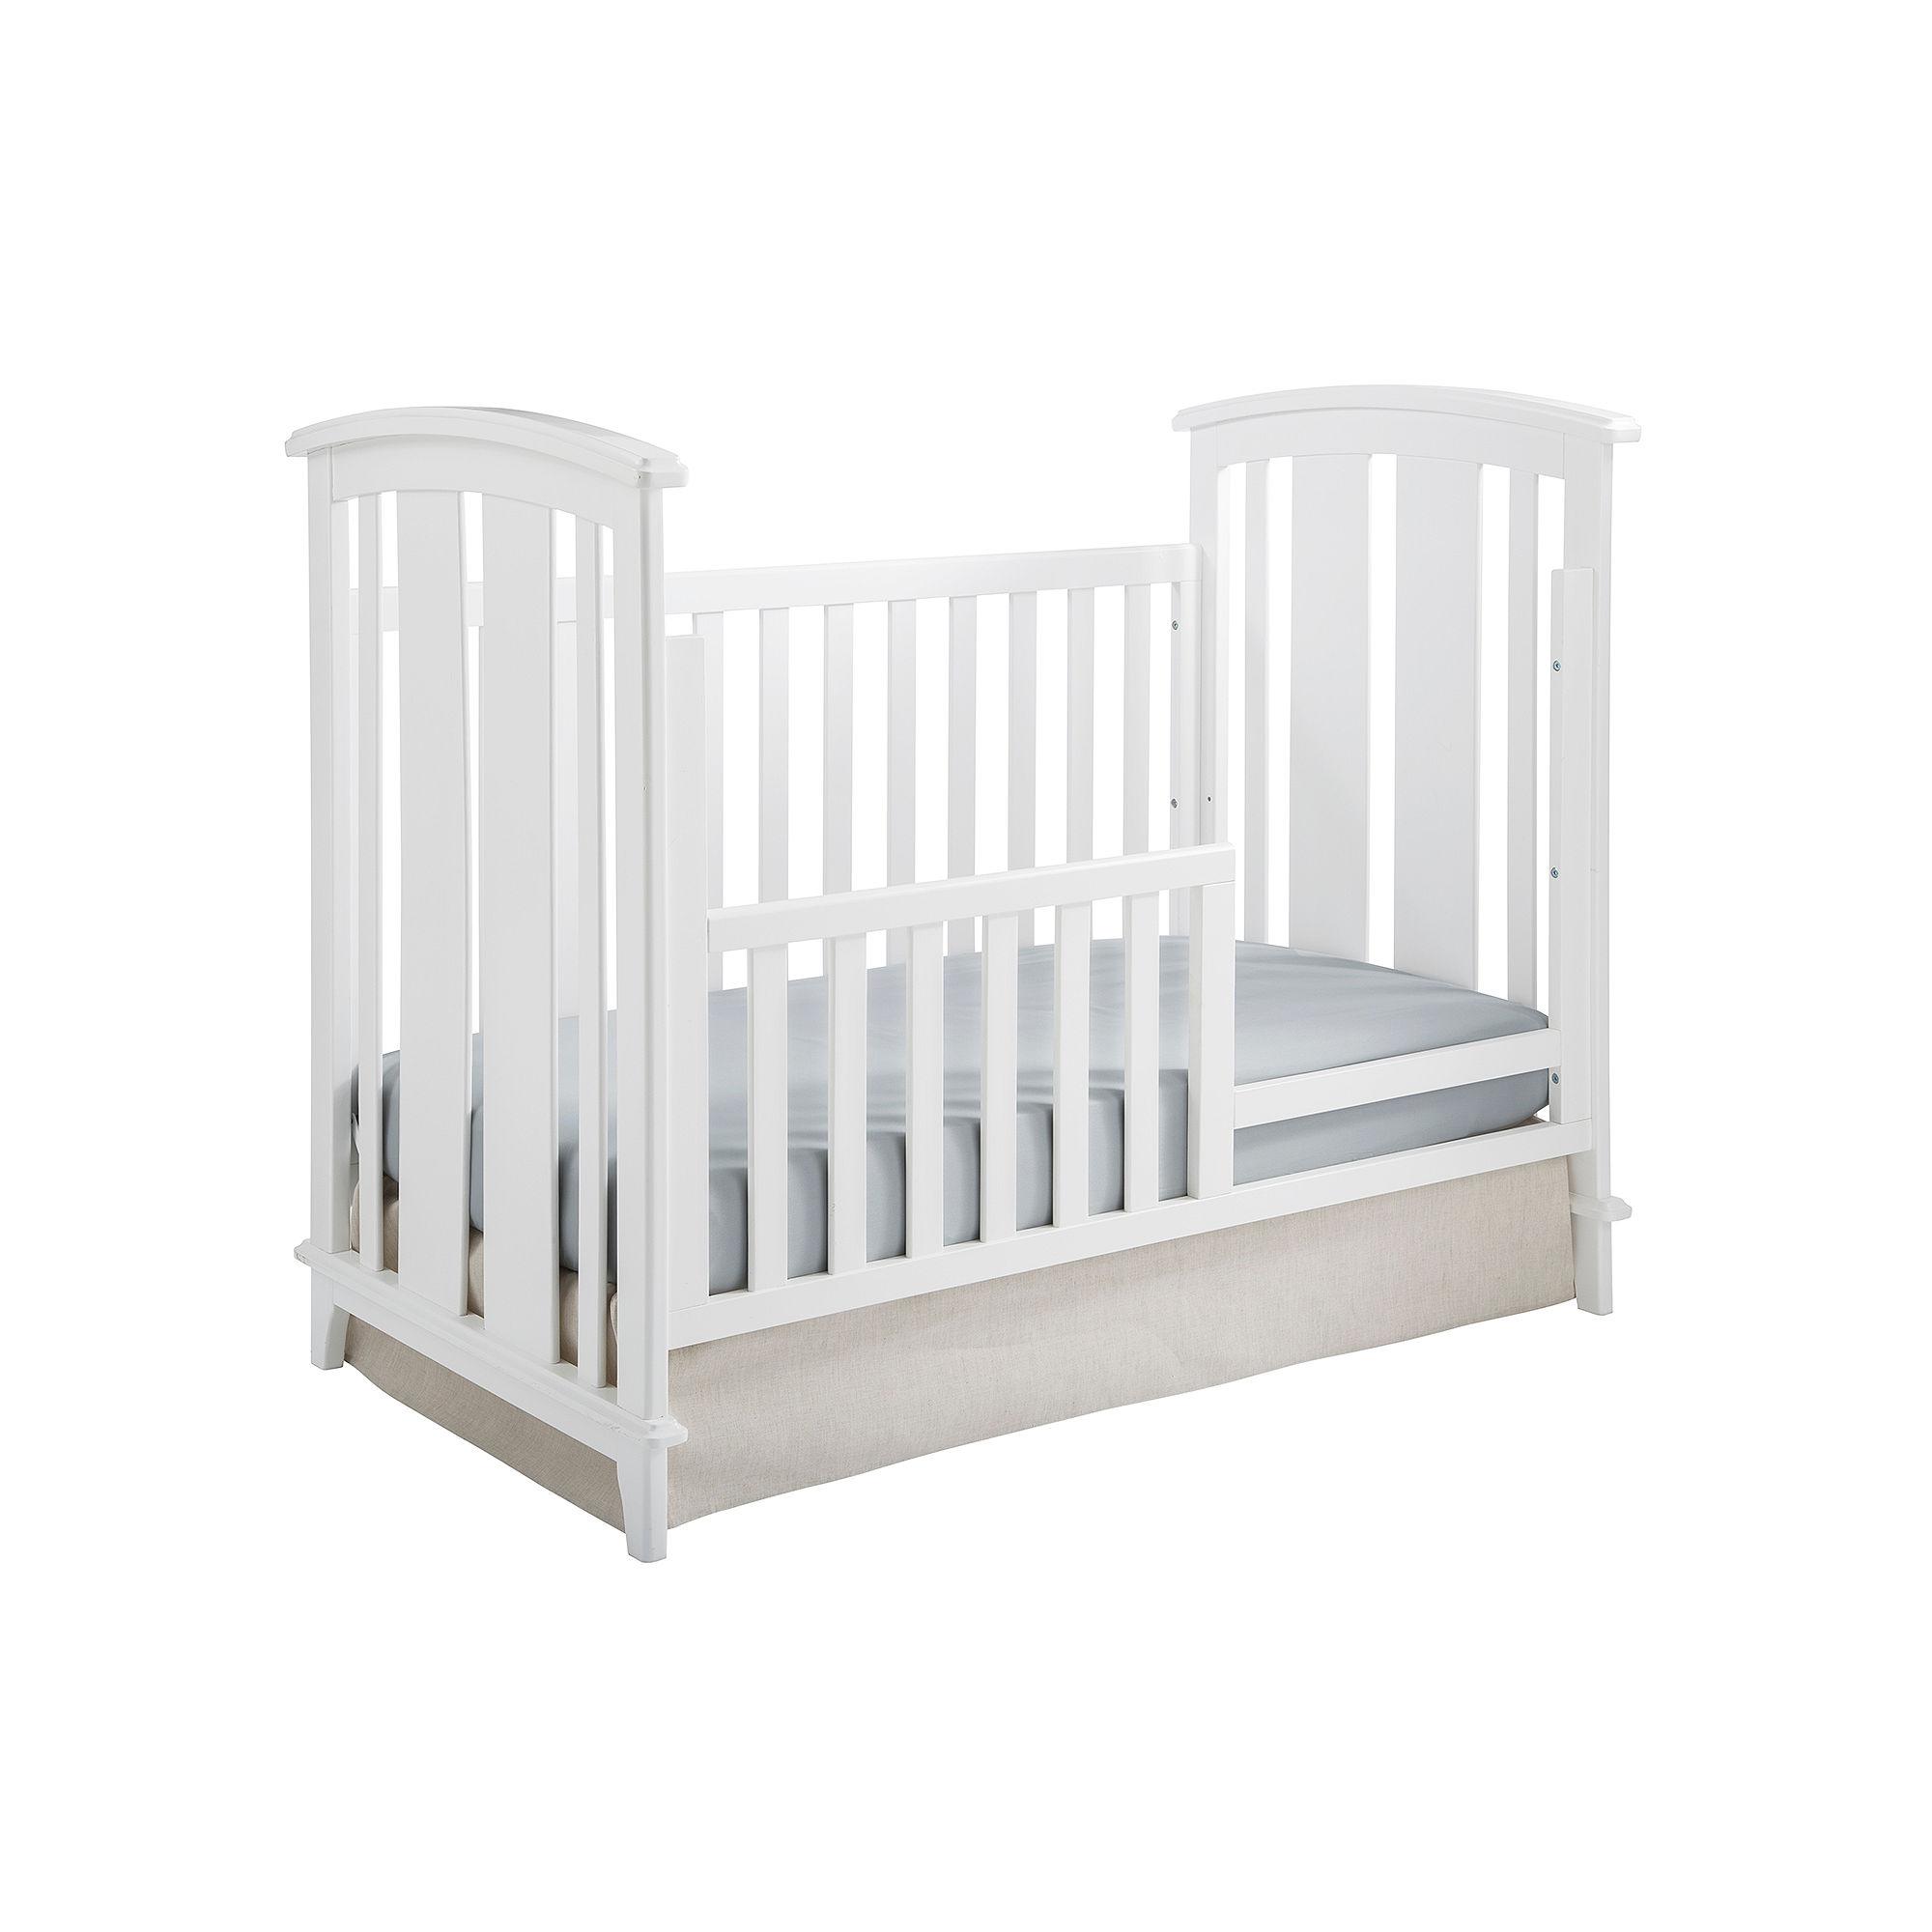 davinci shipping cribs lind raw baby jenny buy alpha save finish today cherry convertible medium crib in mini free rocking wood a